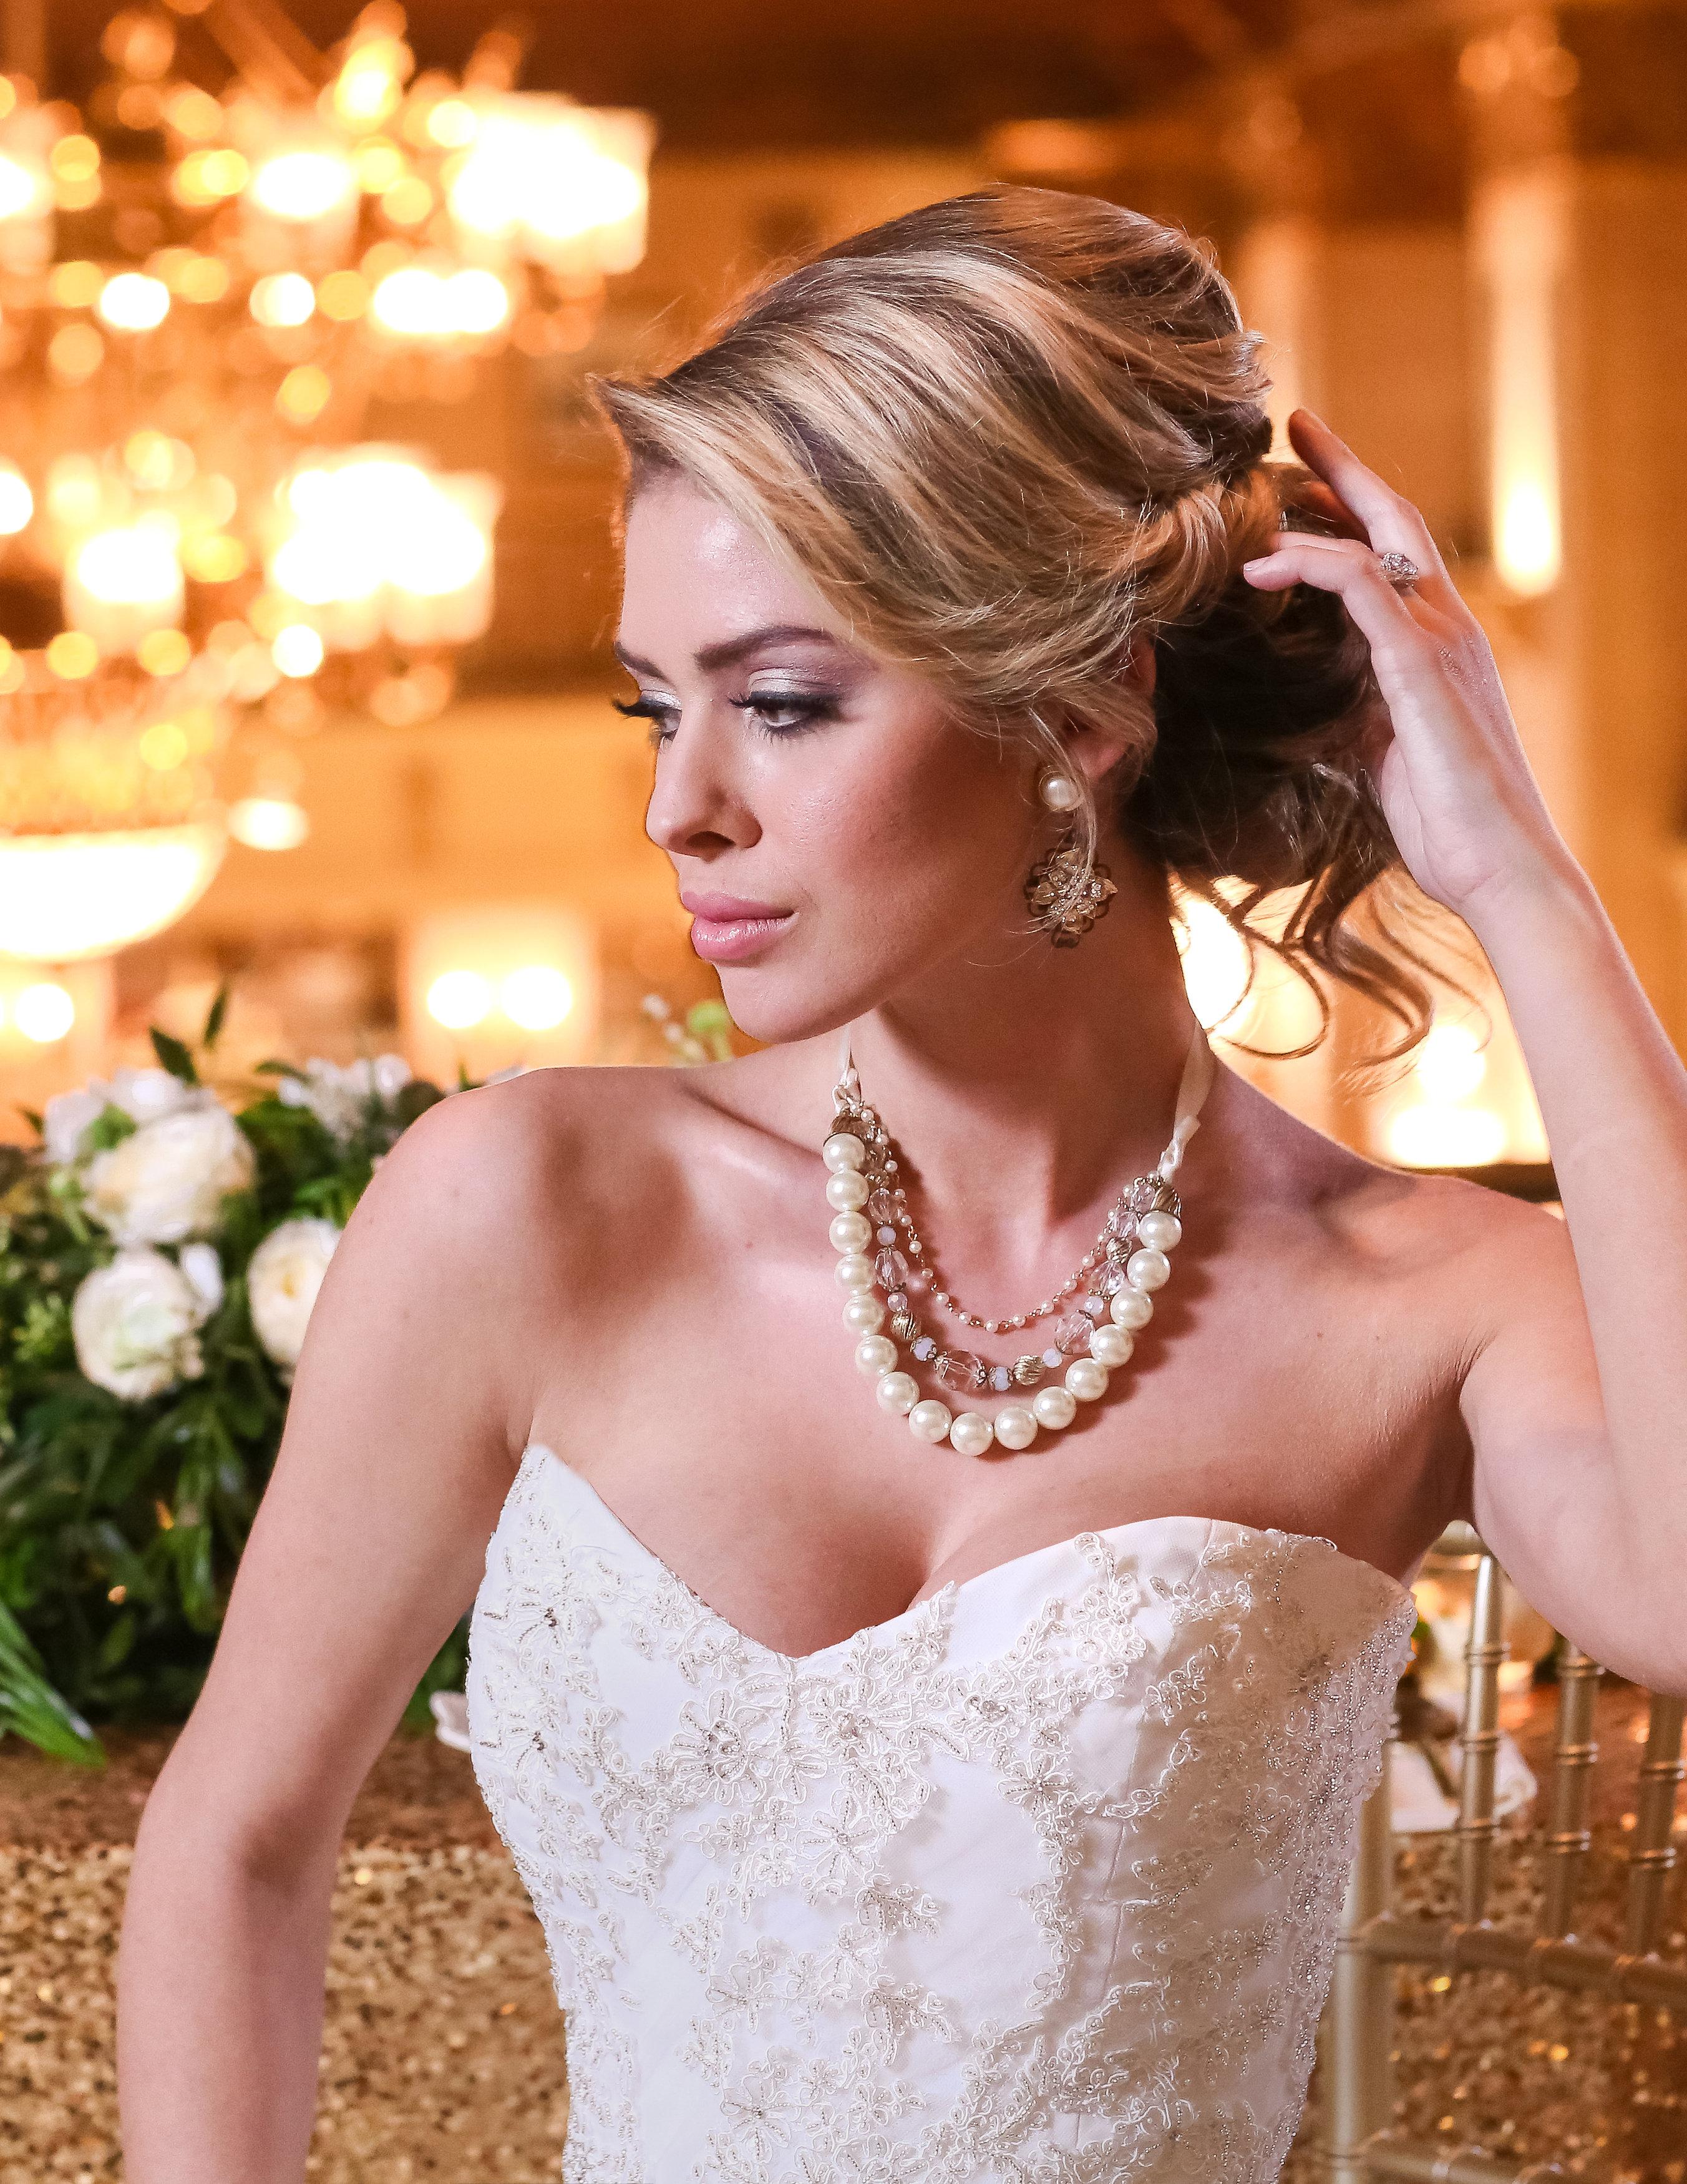 Bridal Makeup & Hair   Mobile Wedding Makeup and Hair, servicing ...